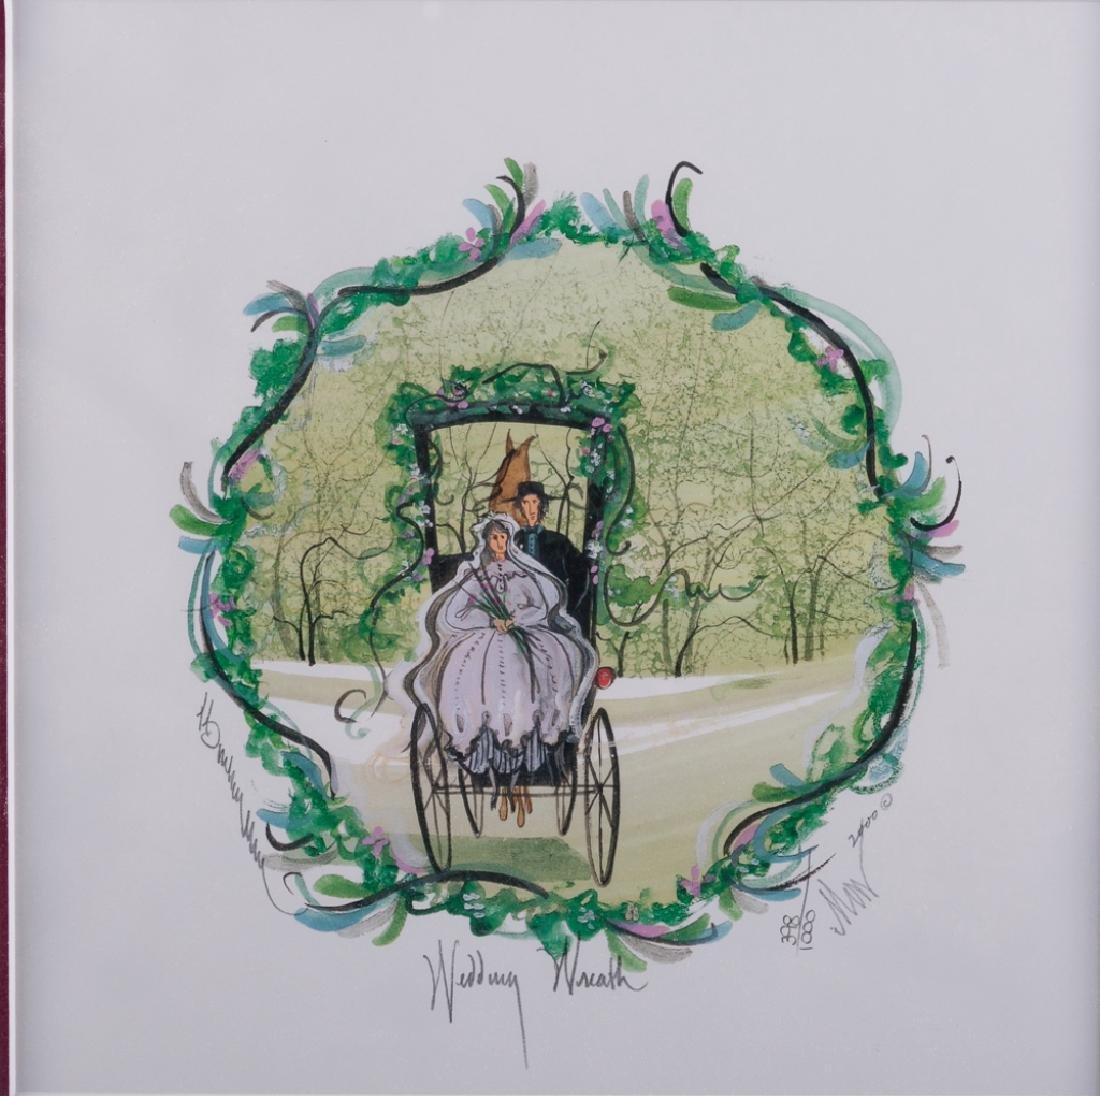 "P. Buckley Moss ""Wedding Wreath"" 398/1000"